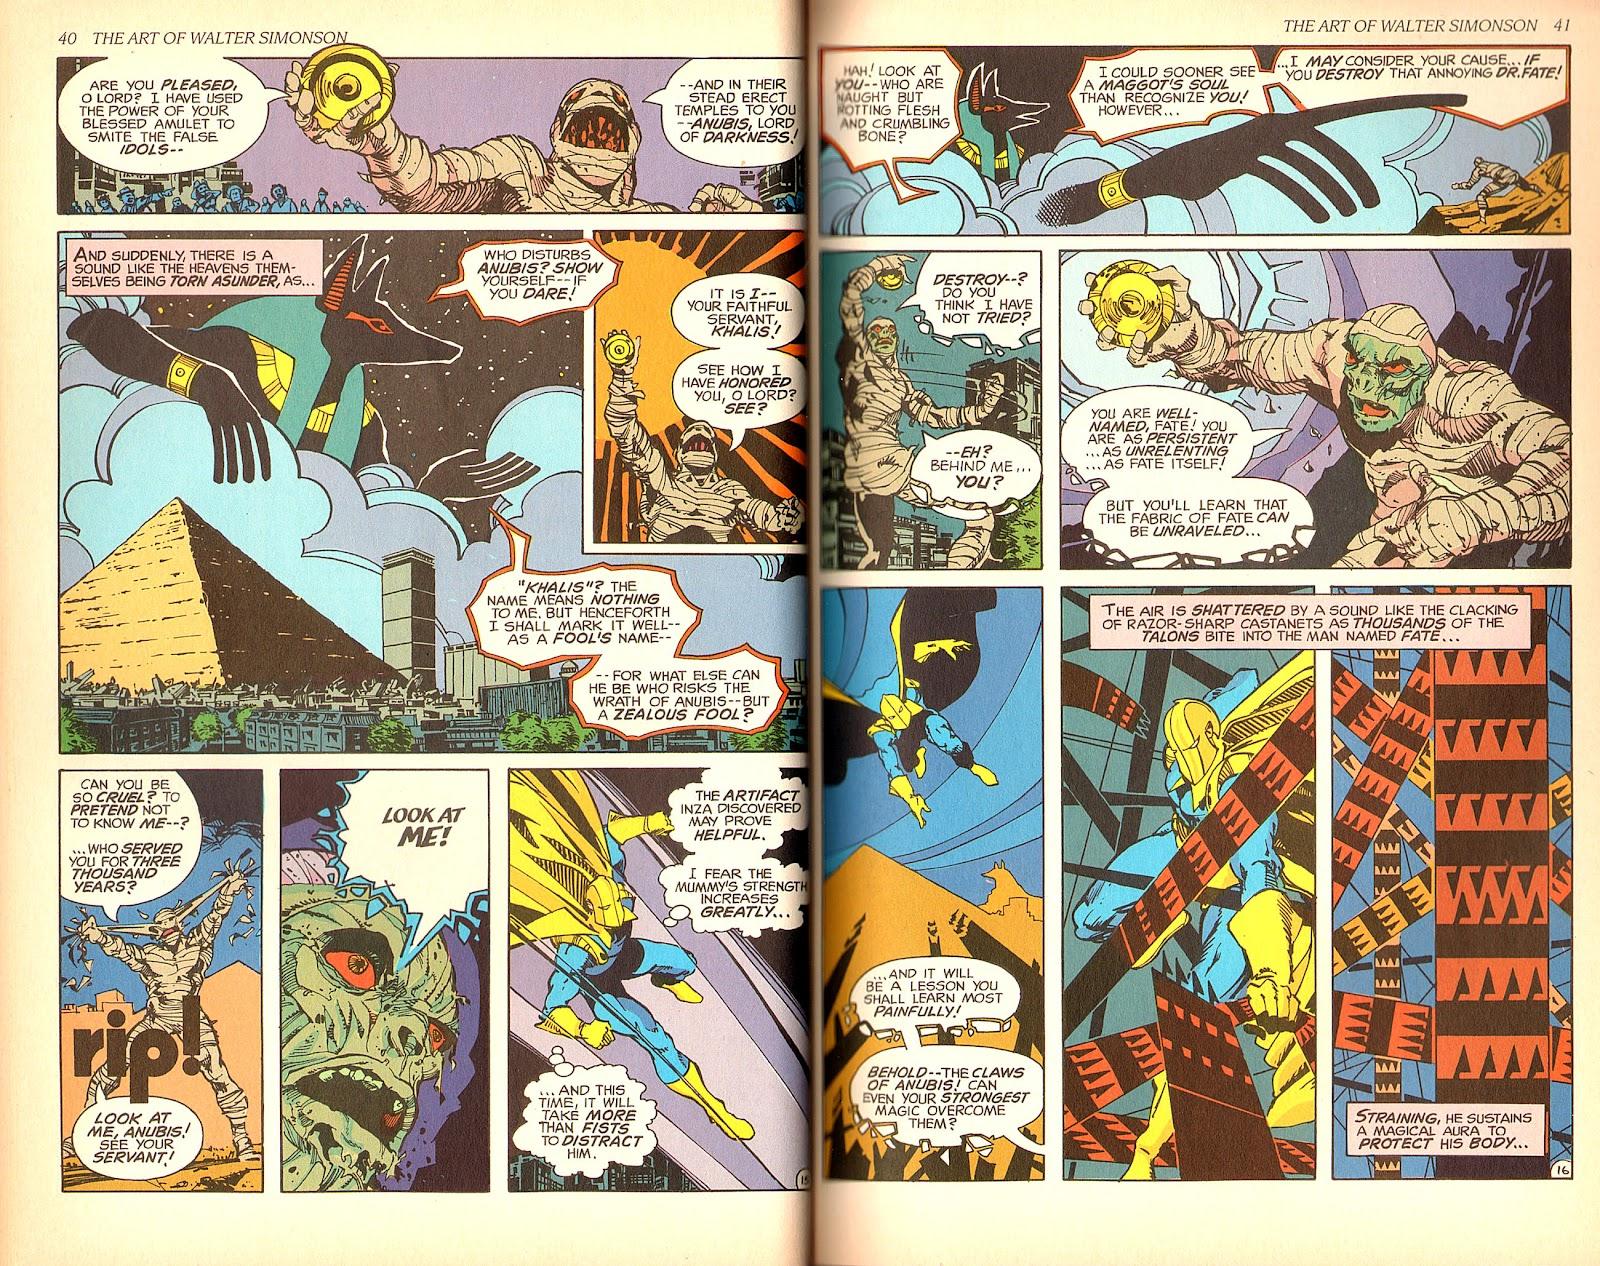 Read online The Art of Walter Simonson comic -  Issue # TPB - 22